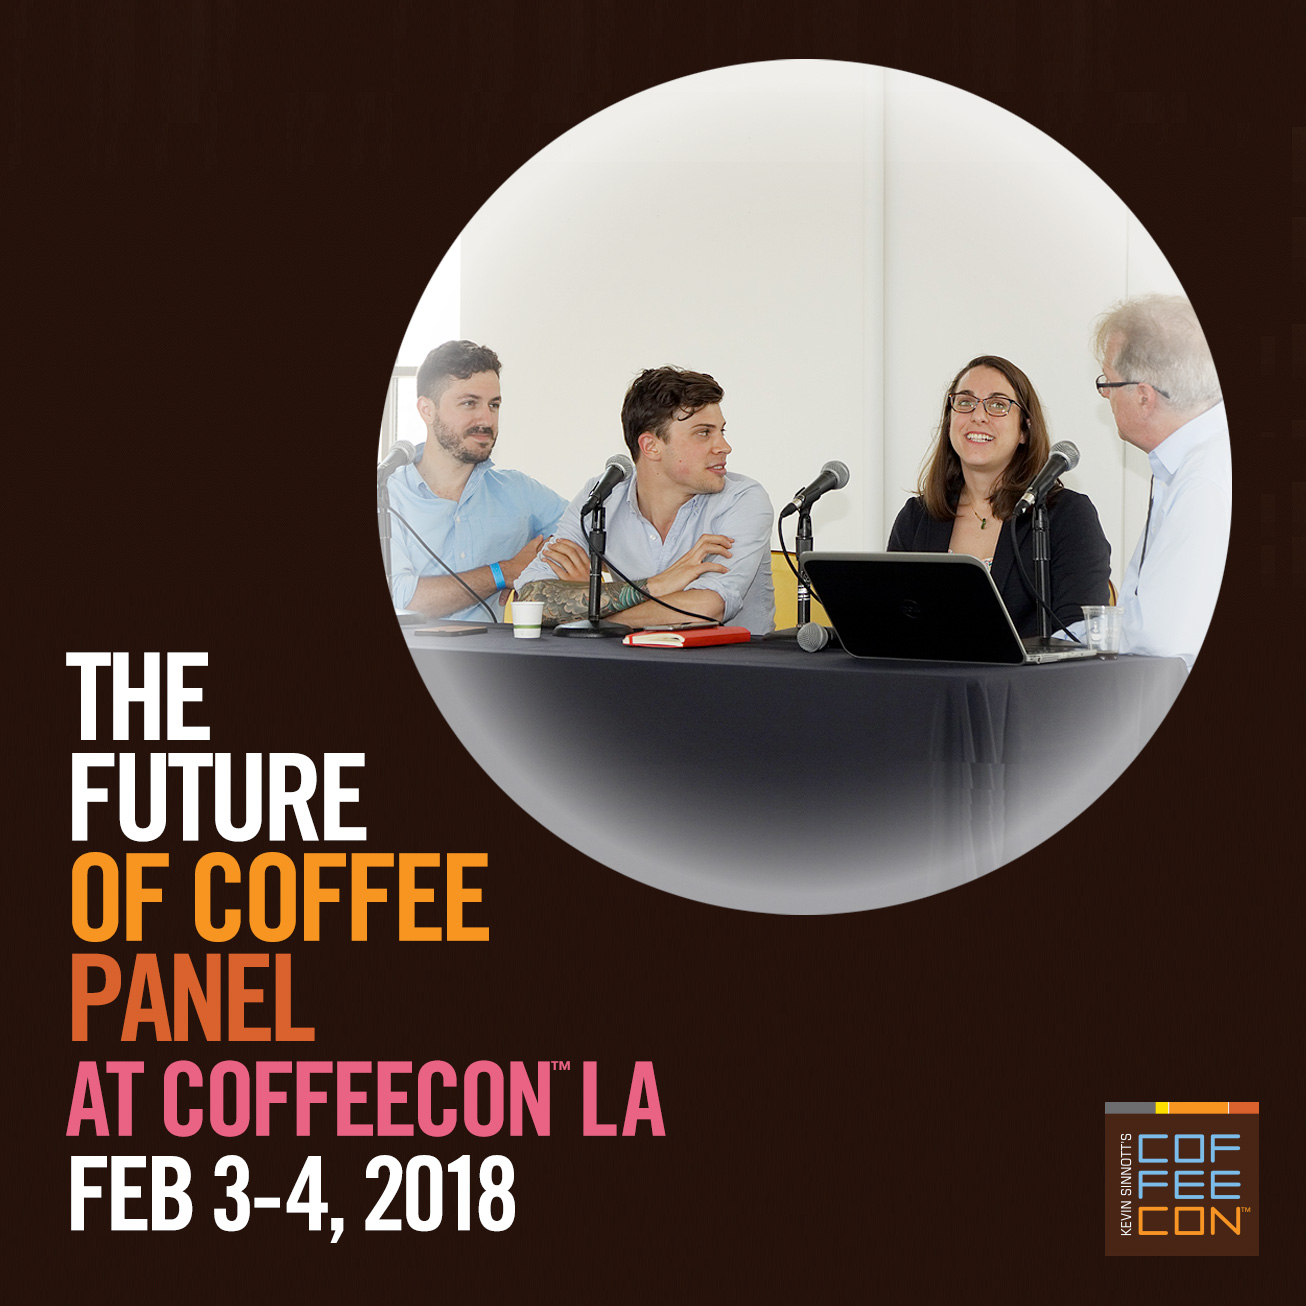 The Future of Coffee Panel at CoffeeConLA 2018